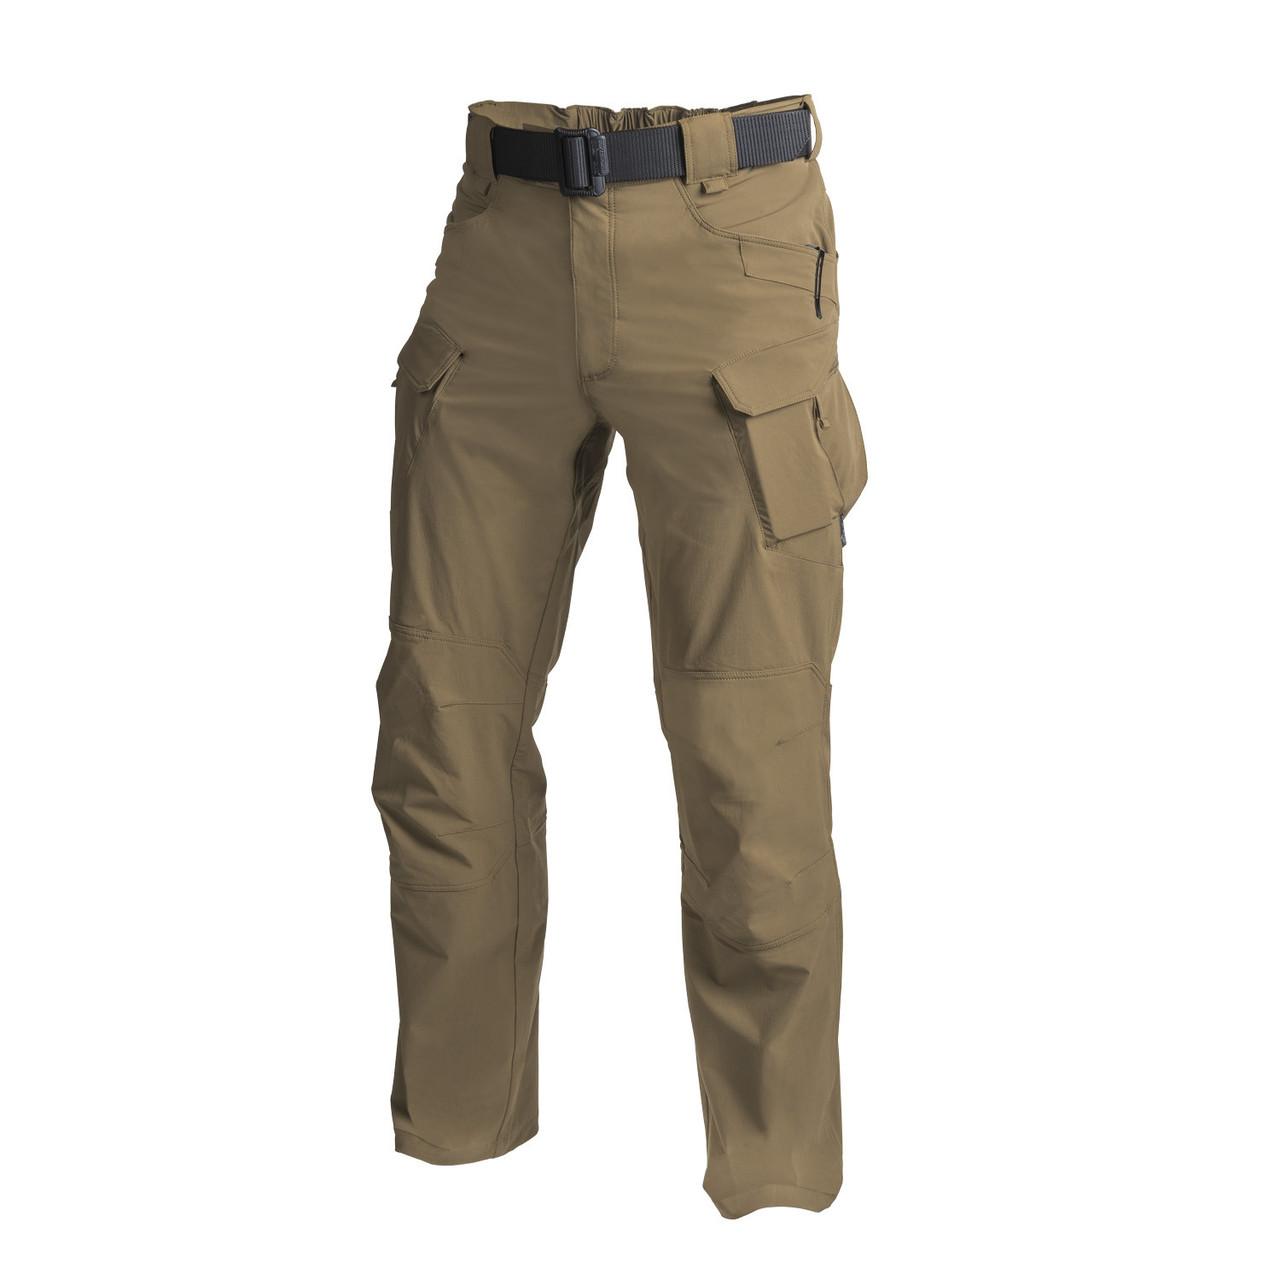 Штани тактичні Helikon - Tex, Outdoor Tactical Pants®. Новий товар.